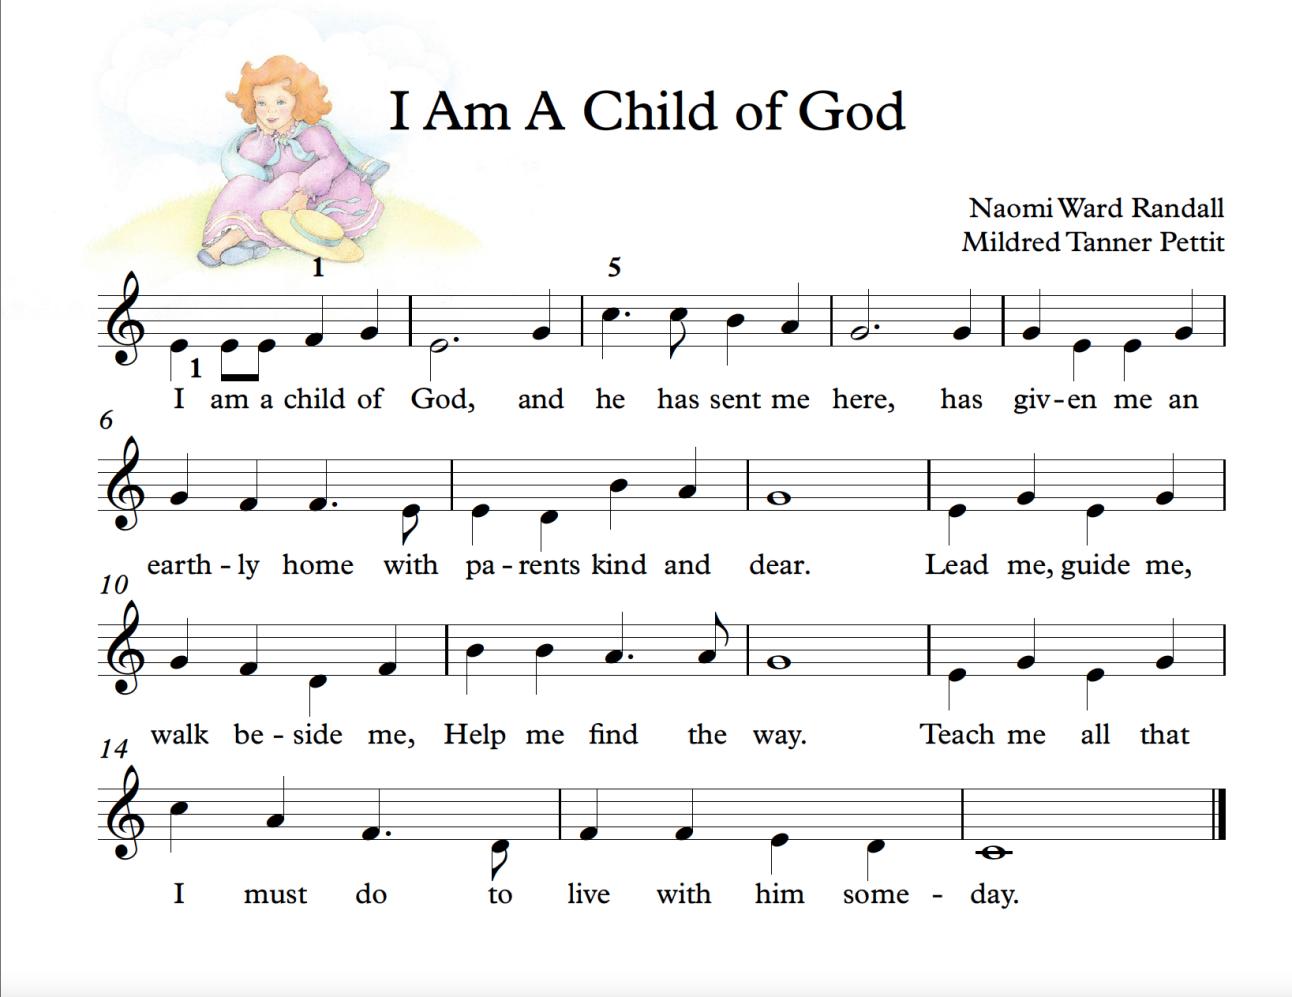 I Am A Child of God BIG NOTE Hymn sheet music, Easy